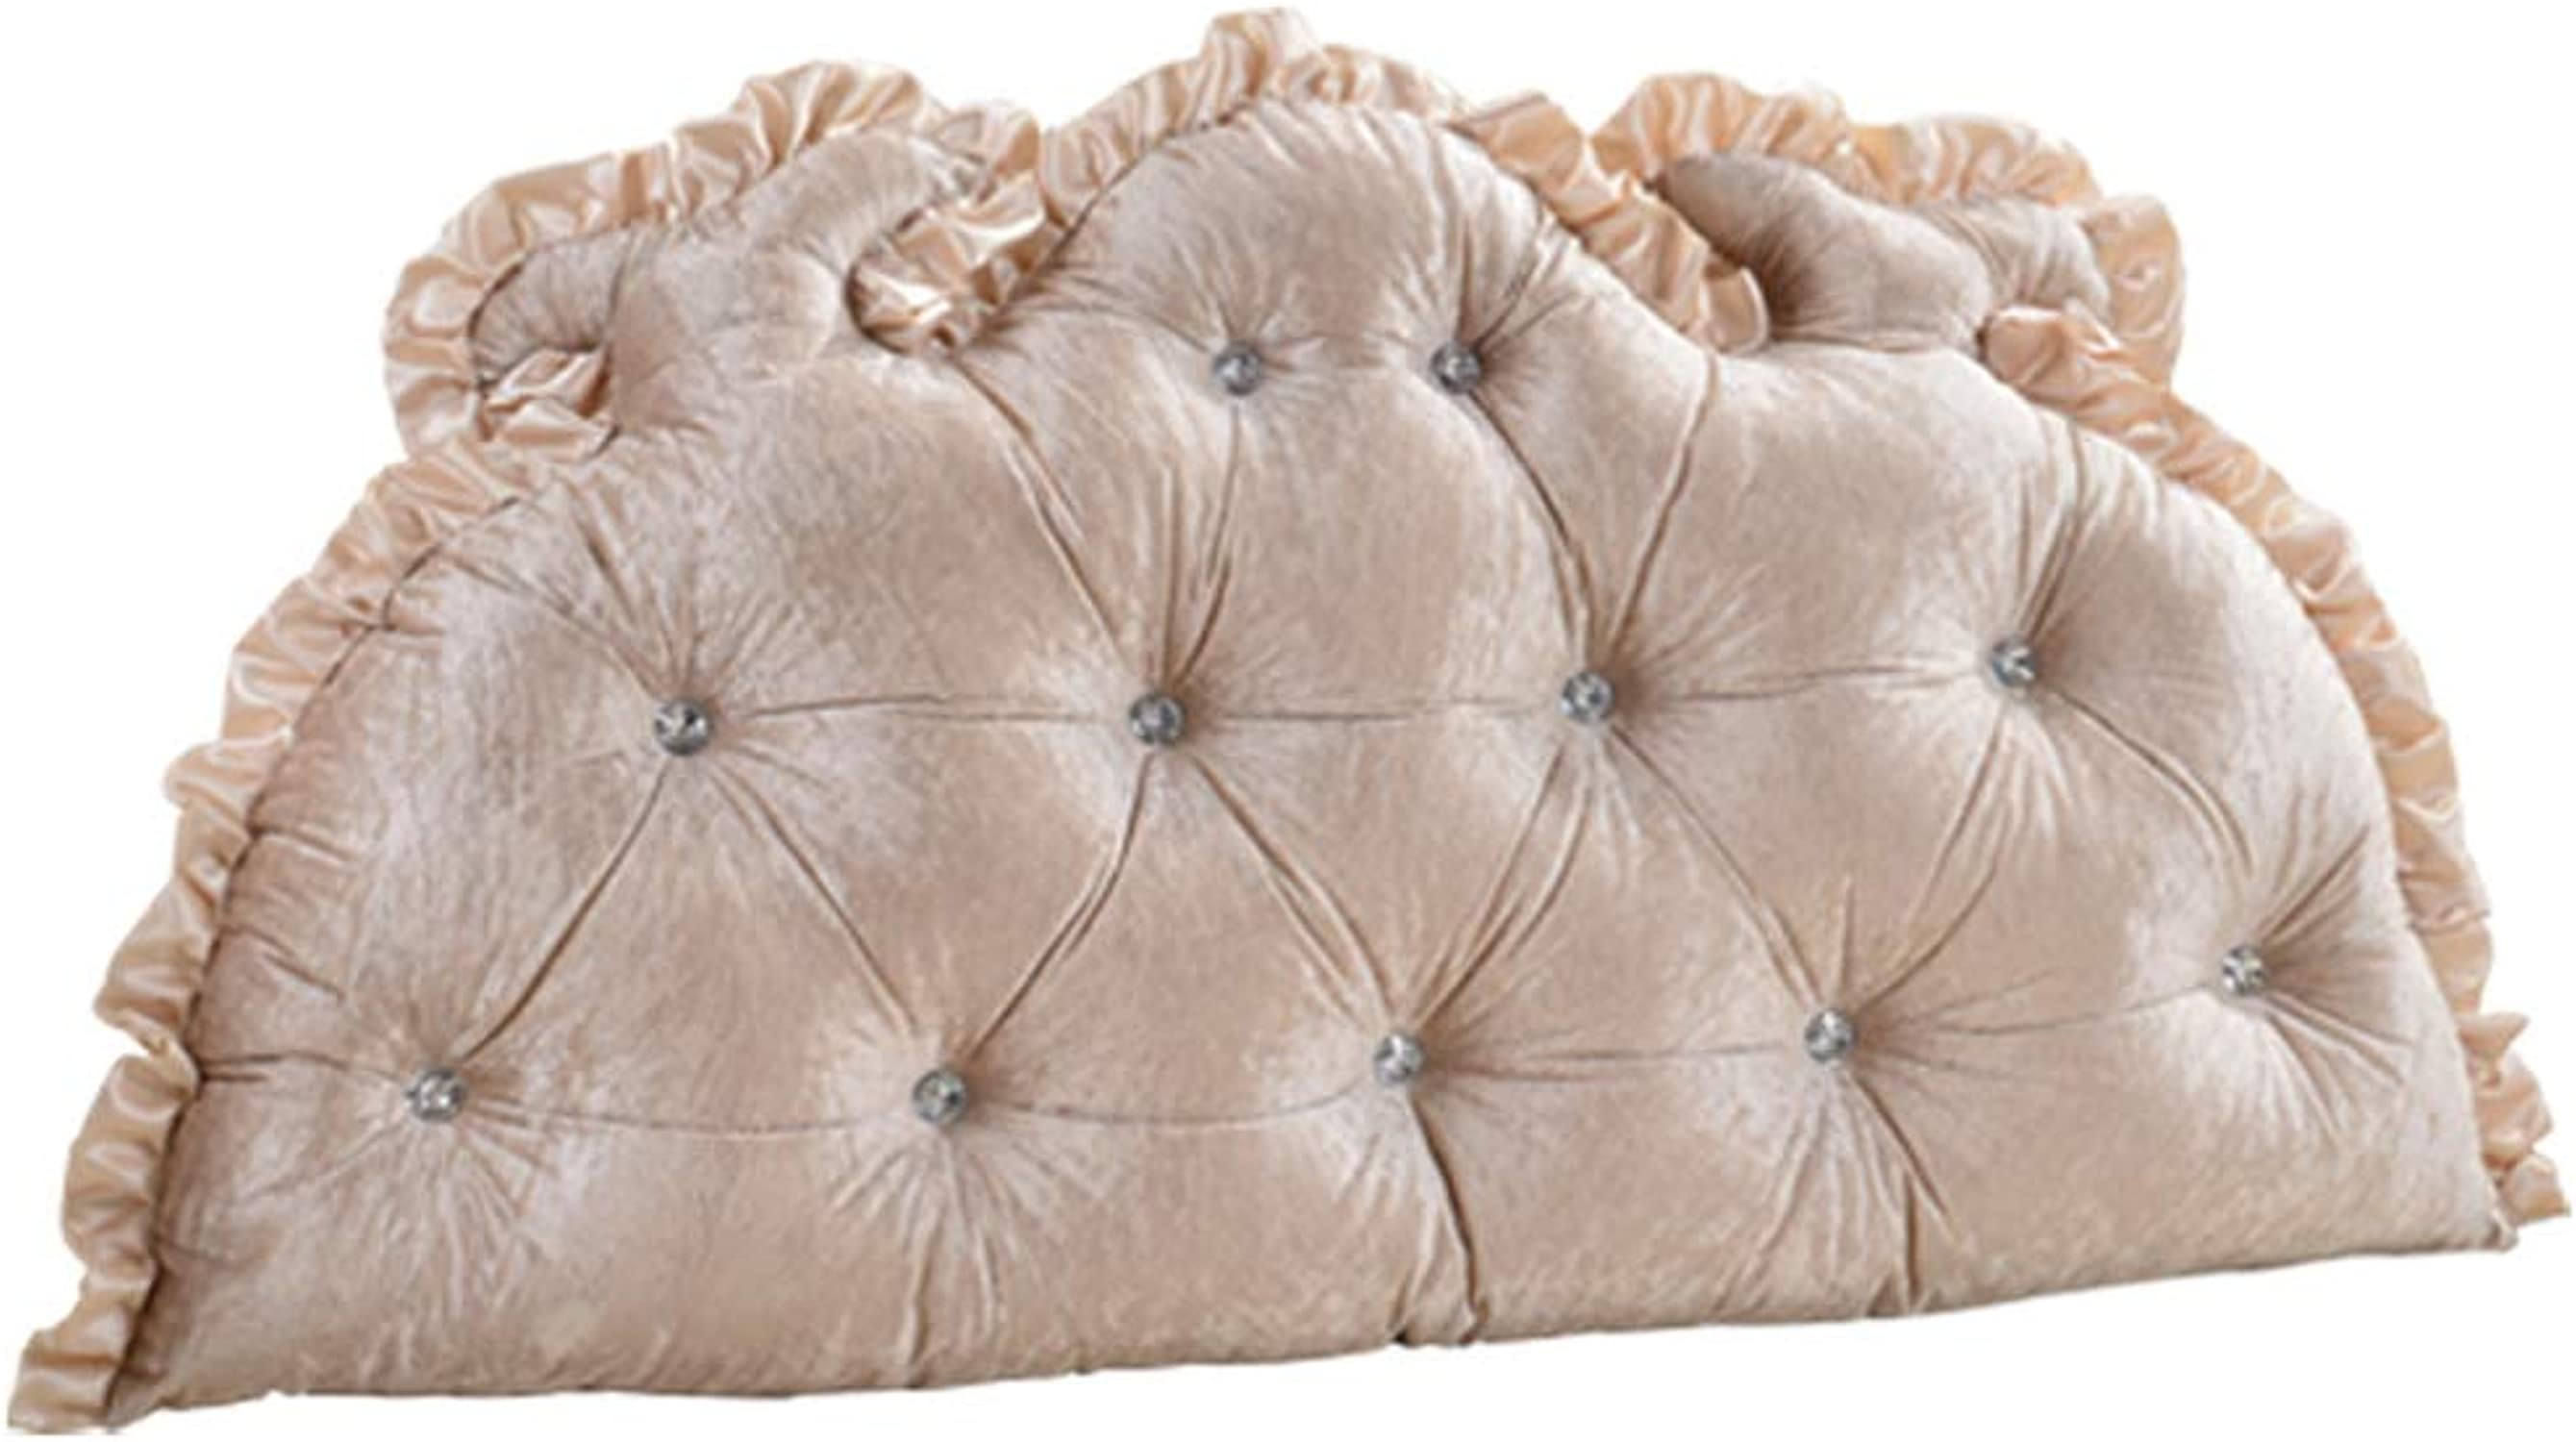 MGMDIAN Triangle coussin lit double soft sac lit grand oreiller lit dossier amovible Dossier en trois diPour des hommesions (Taille   200  75cm)